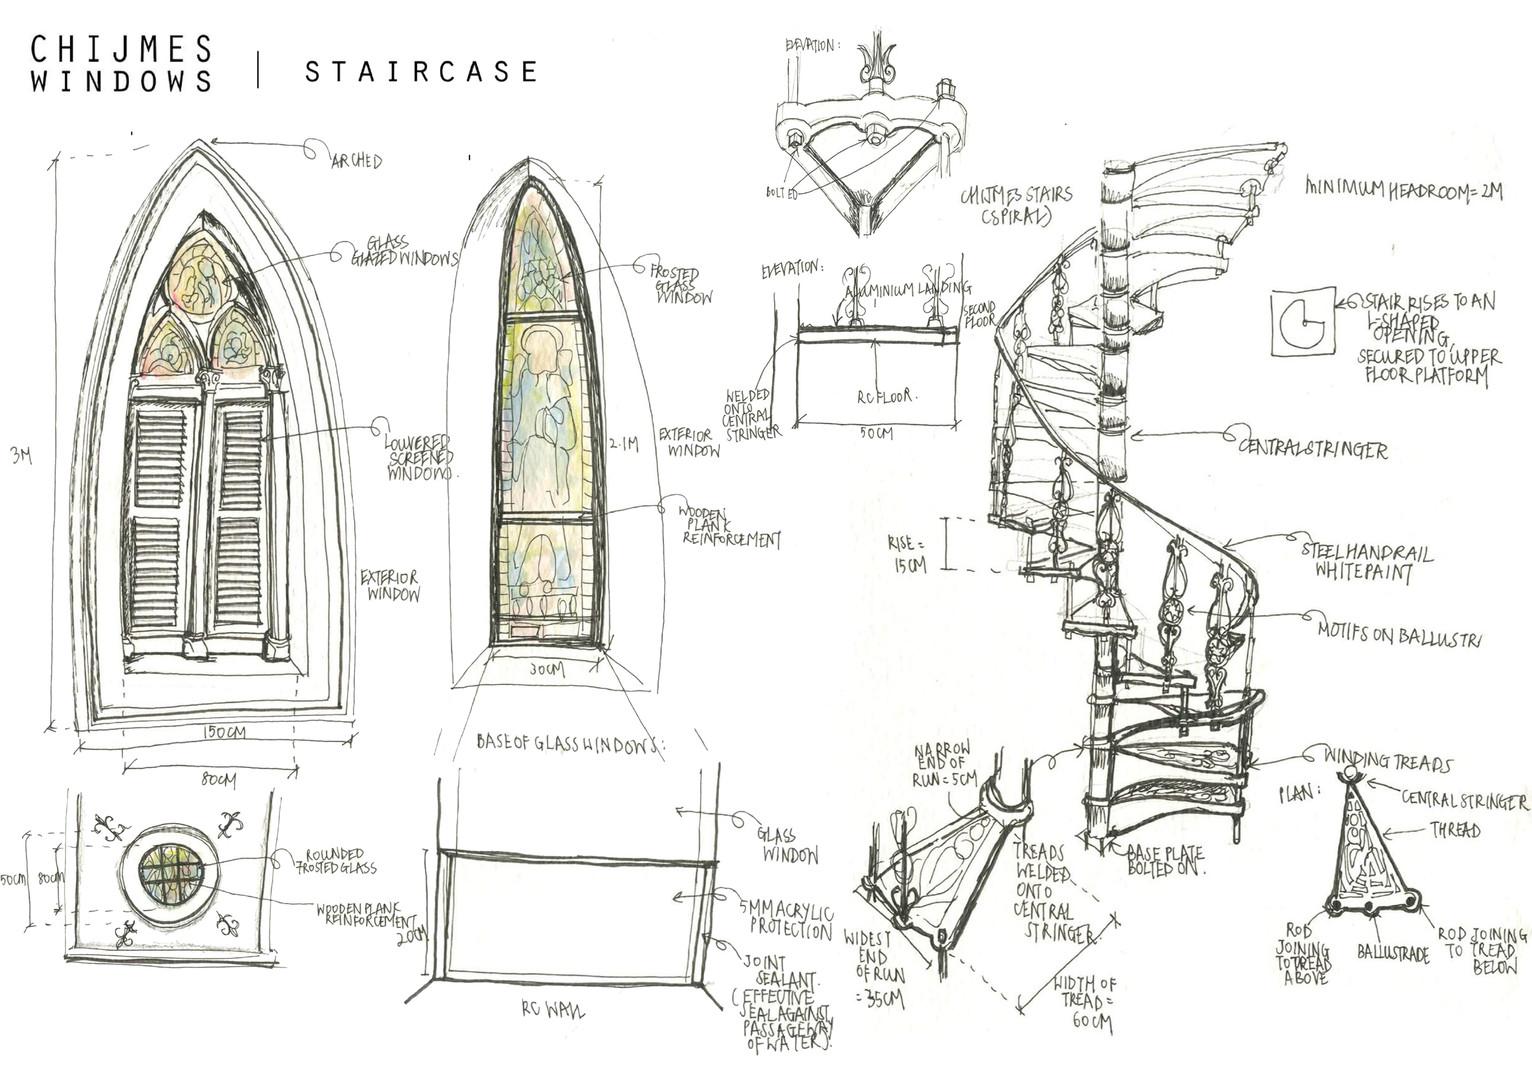 URBAN SKETCH 02Construction Details, CHIJMES